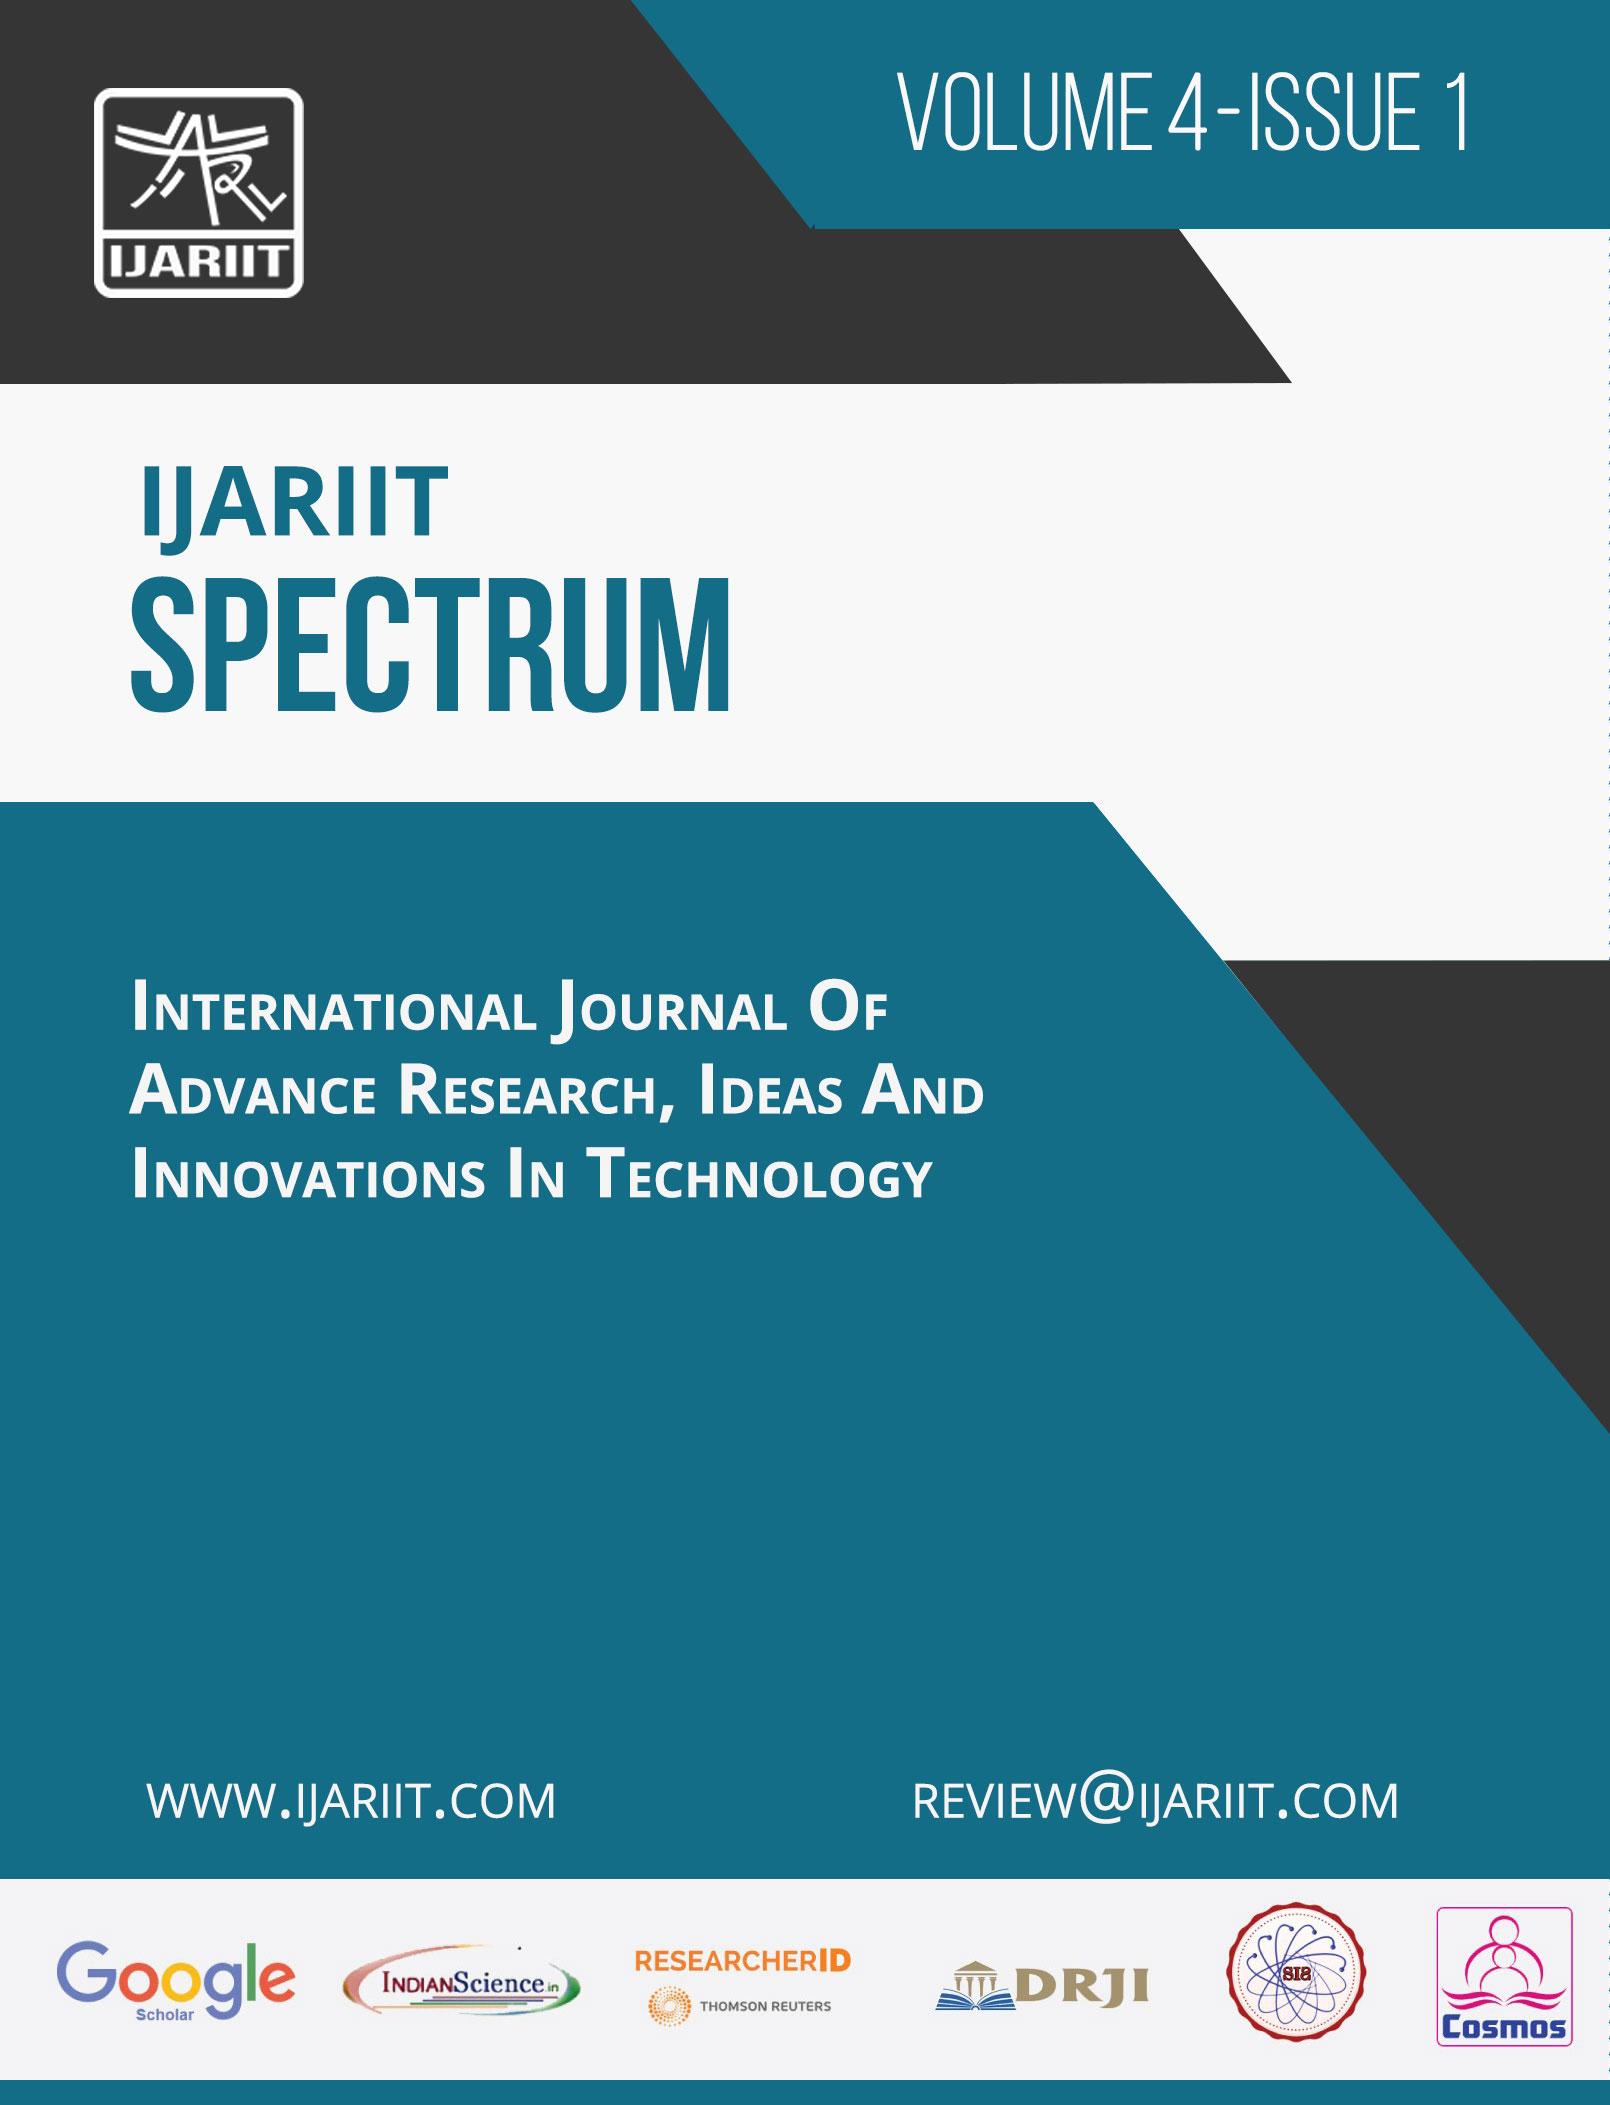 Edition Volume 4 Issue 1 Ijariit